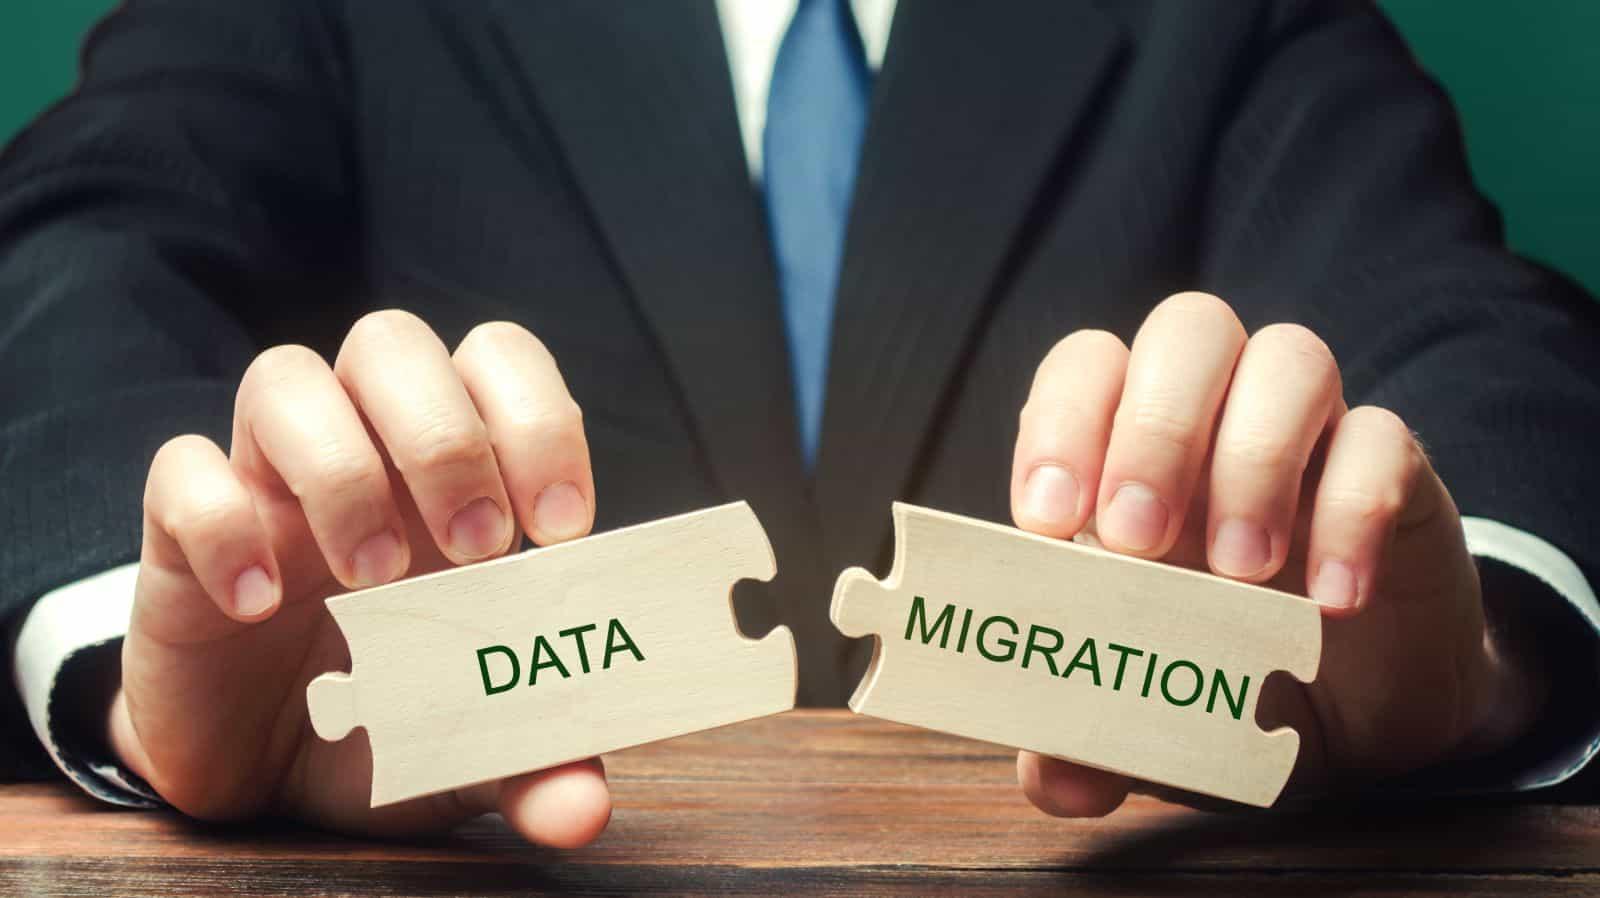 Data Migration Image